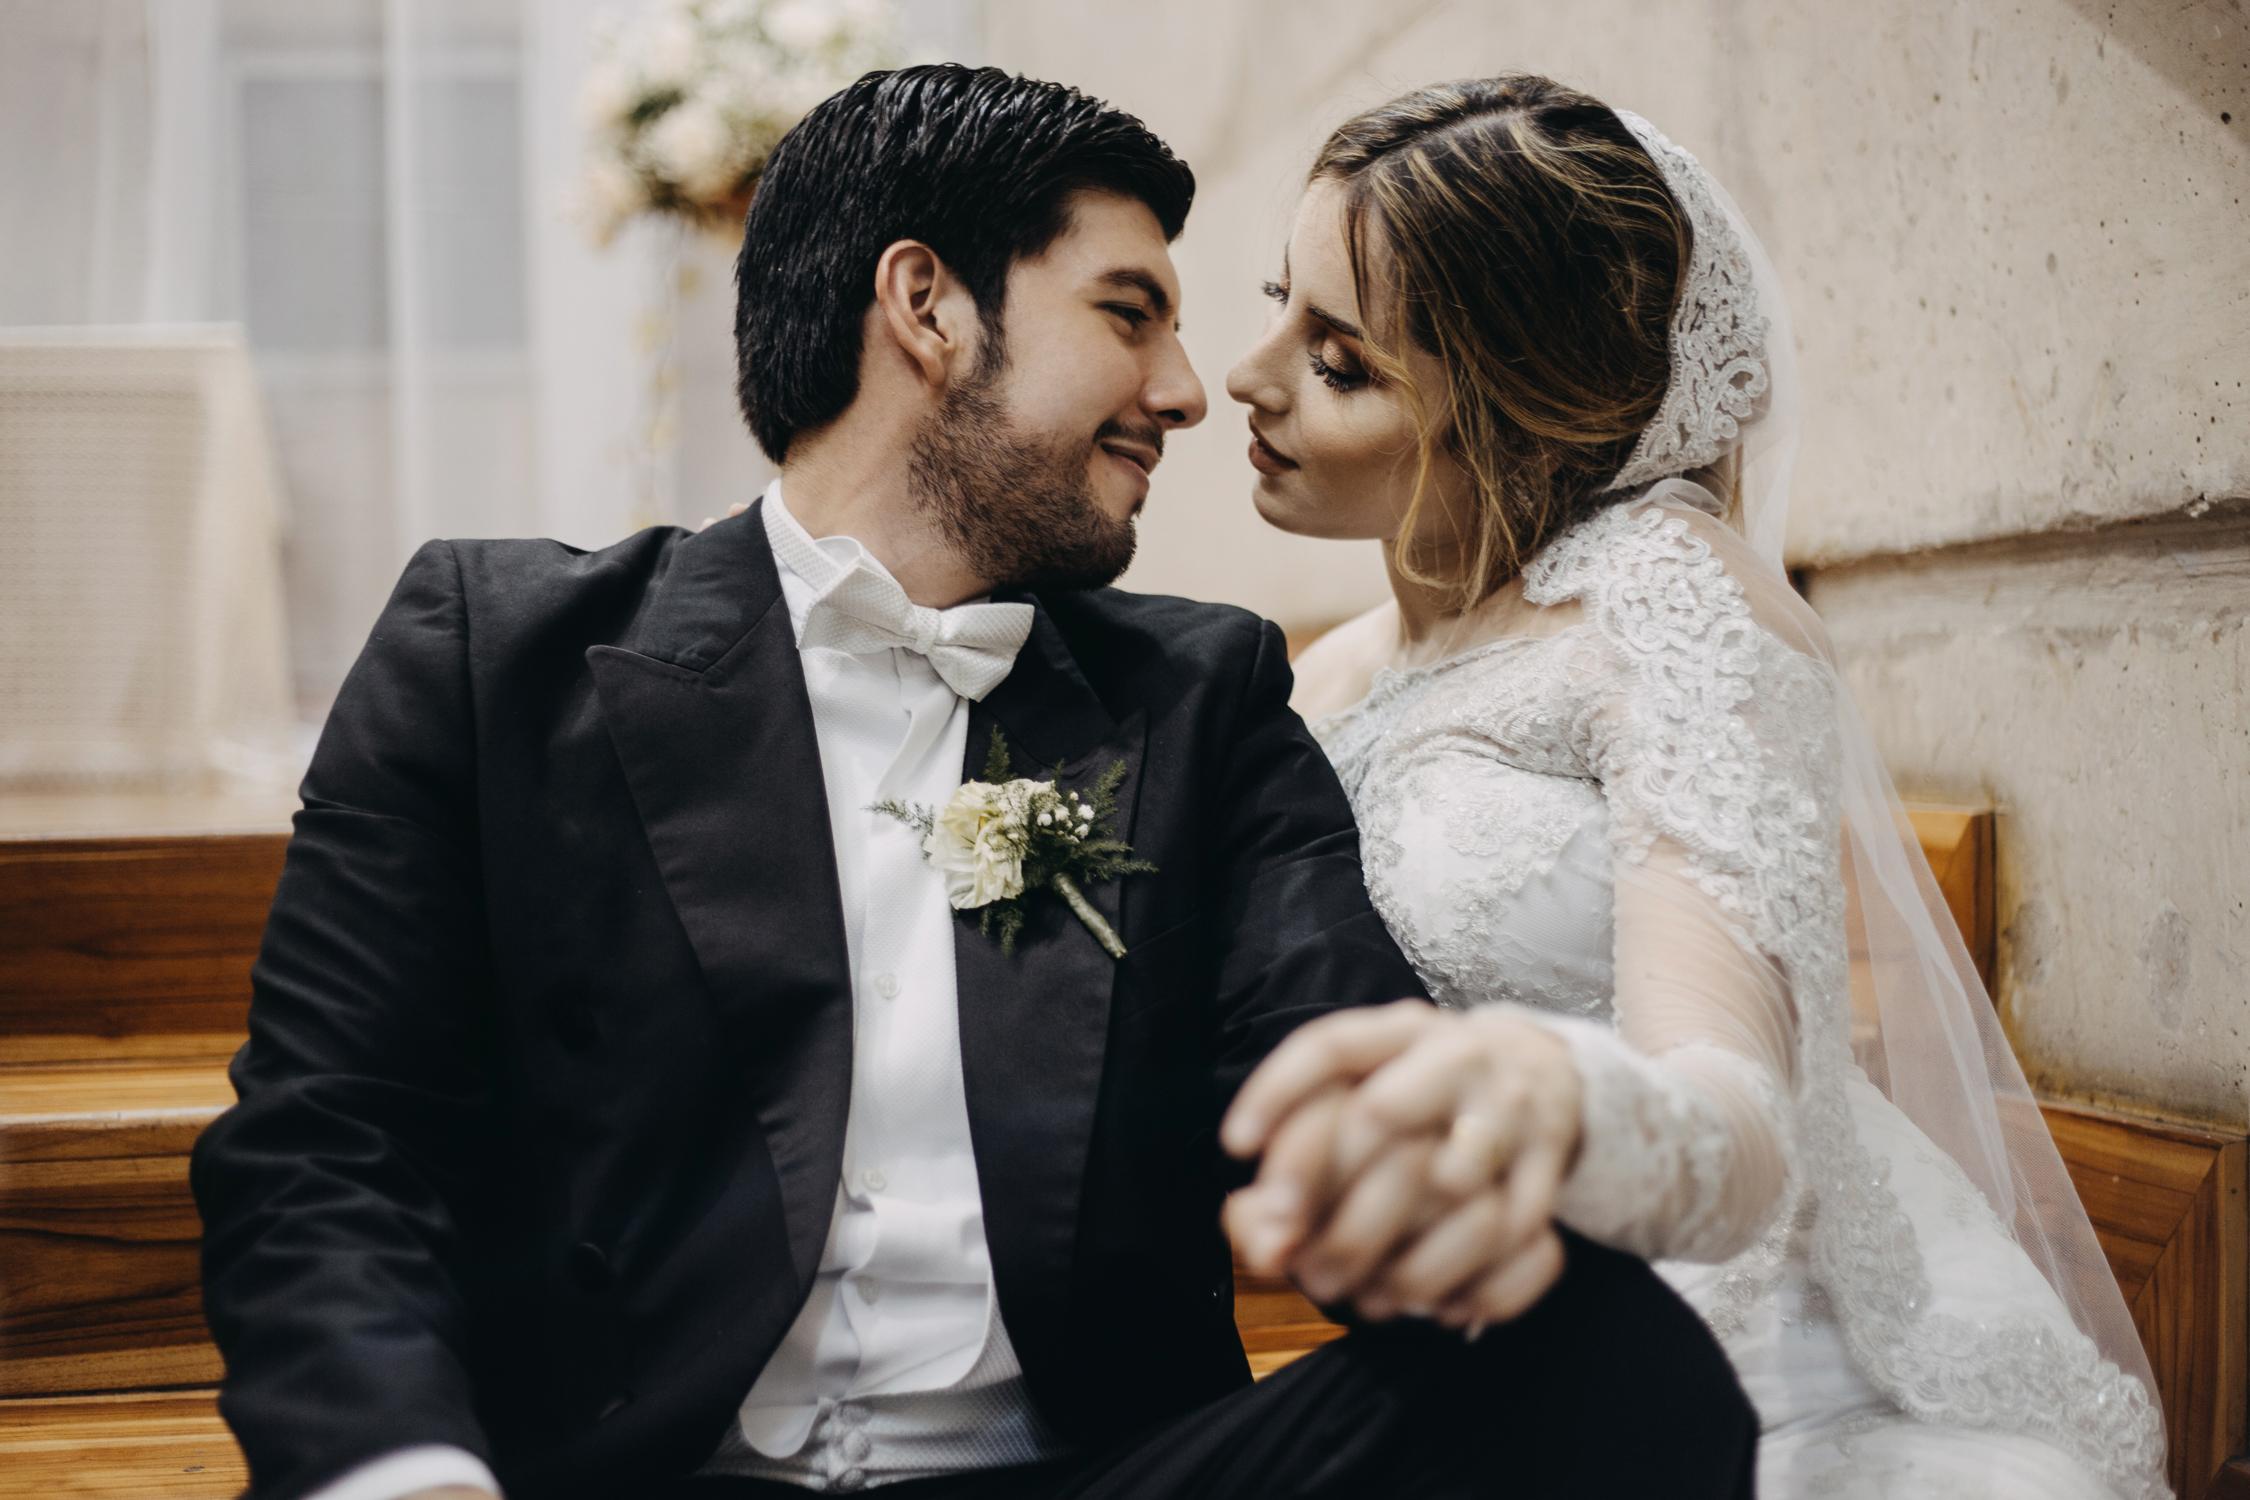 Michelle-Agurto-Fotografia-Bodas-Ecuador-Destination-Wedding-Photographer-Vicky-Javier-199.JPG